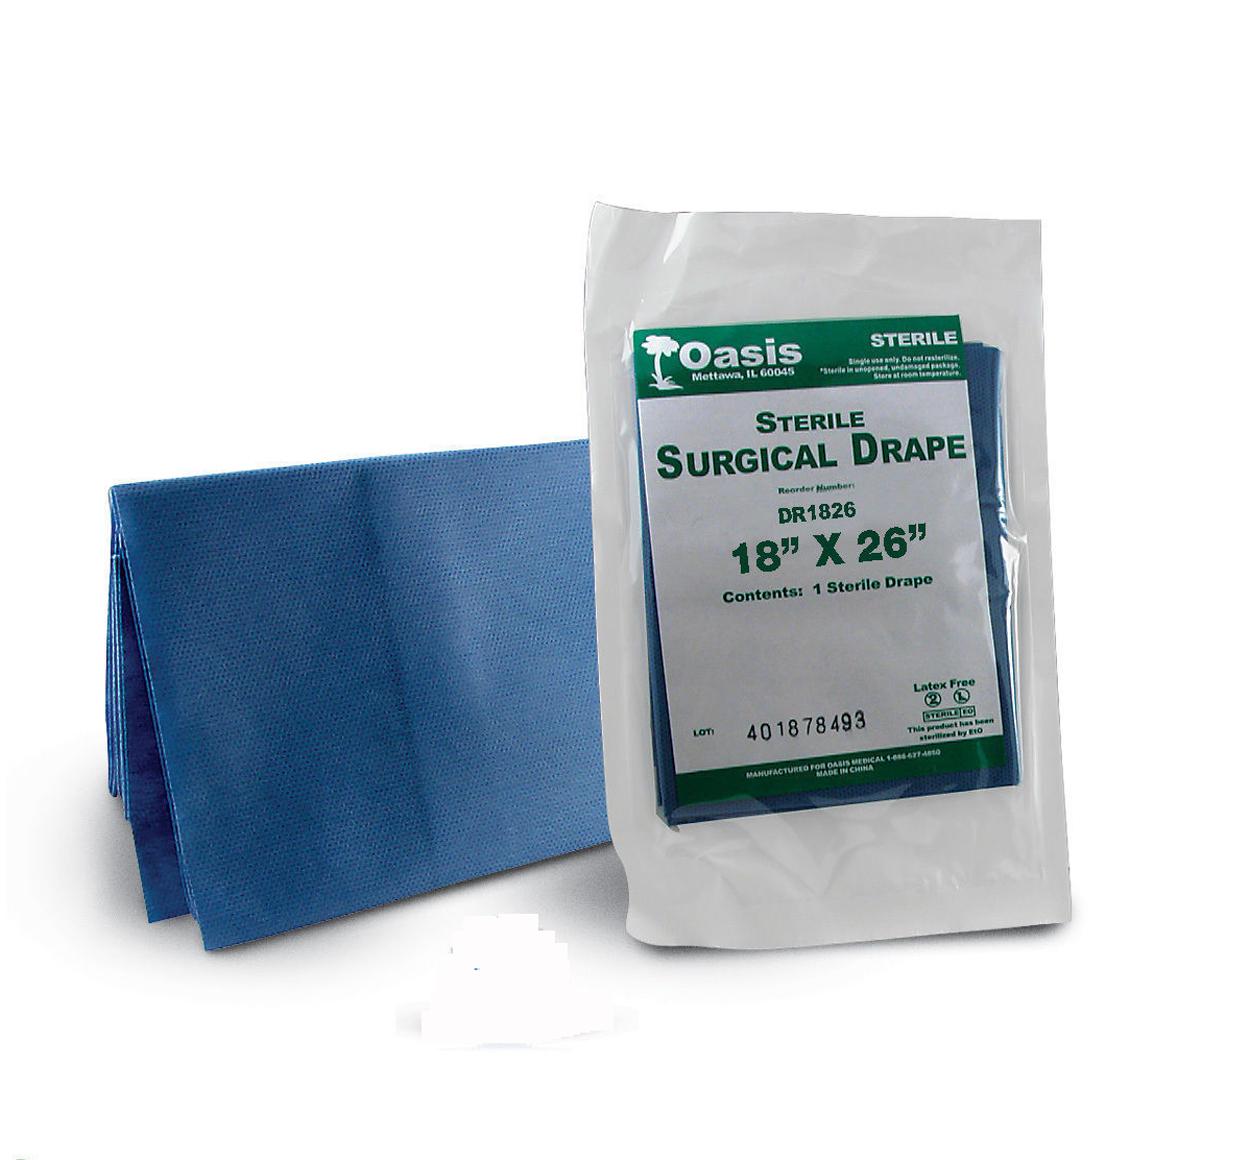 Sterile Surgical Drape